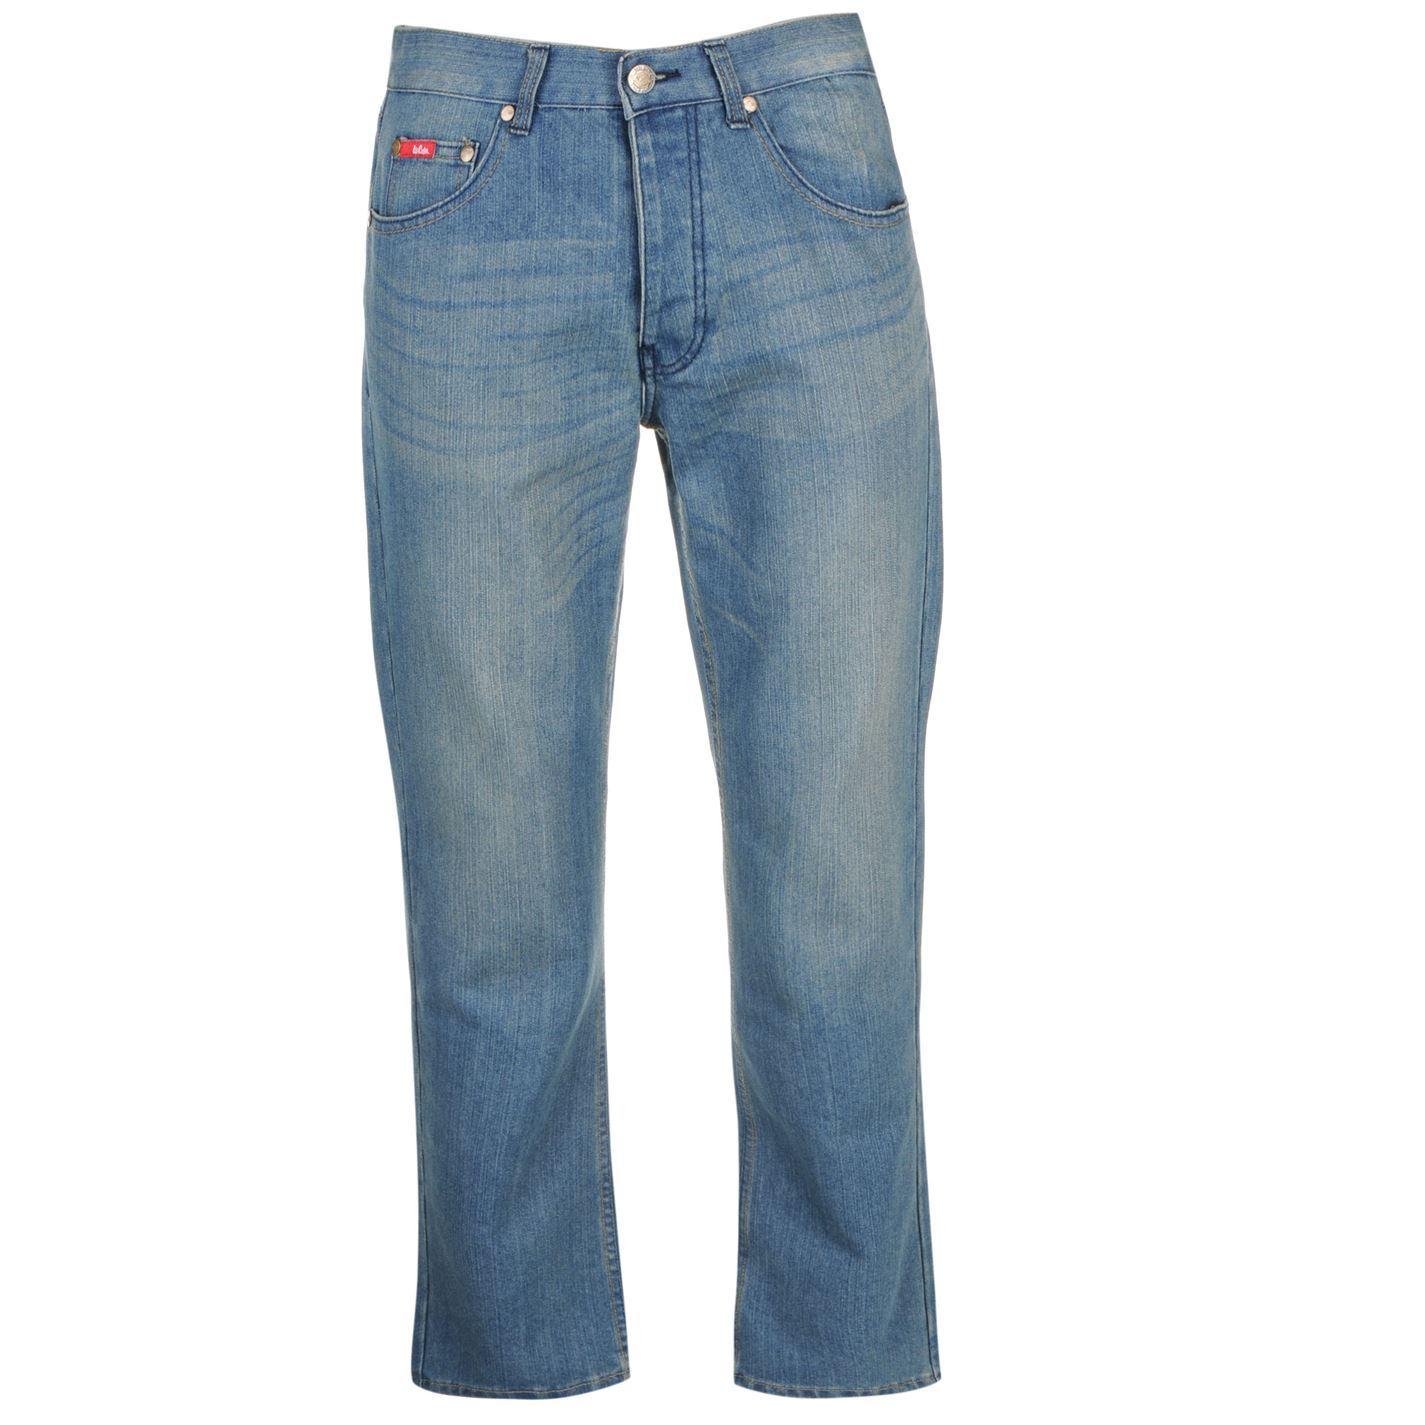 lee cooper mens regular jeans pants trousers casual everyday clothing wear ebay. Black Bedroom Furniture Sets. Home Design Ideas